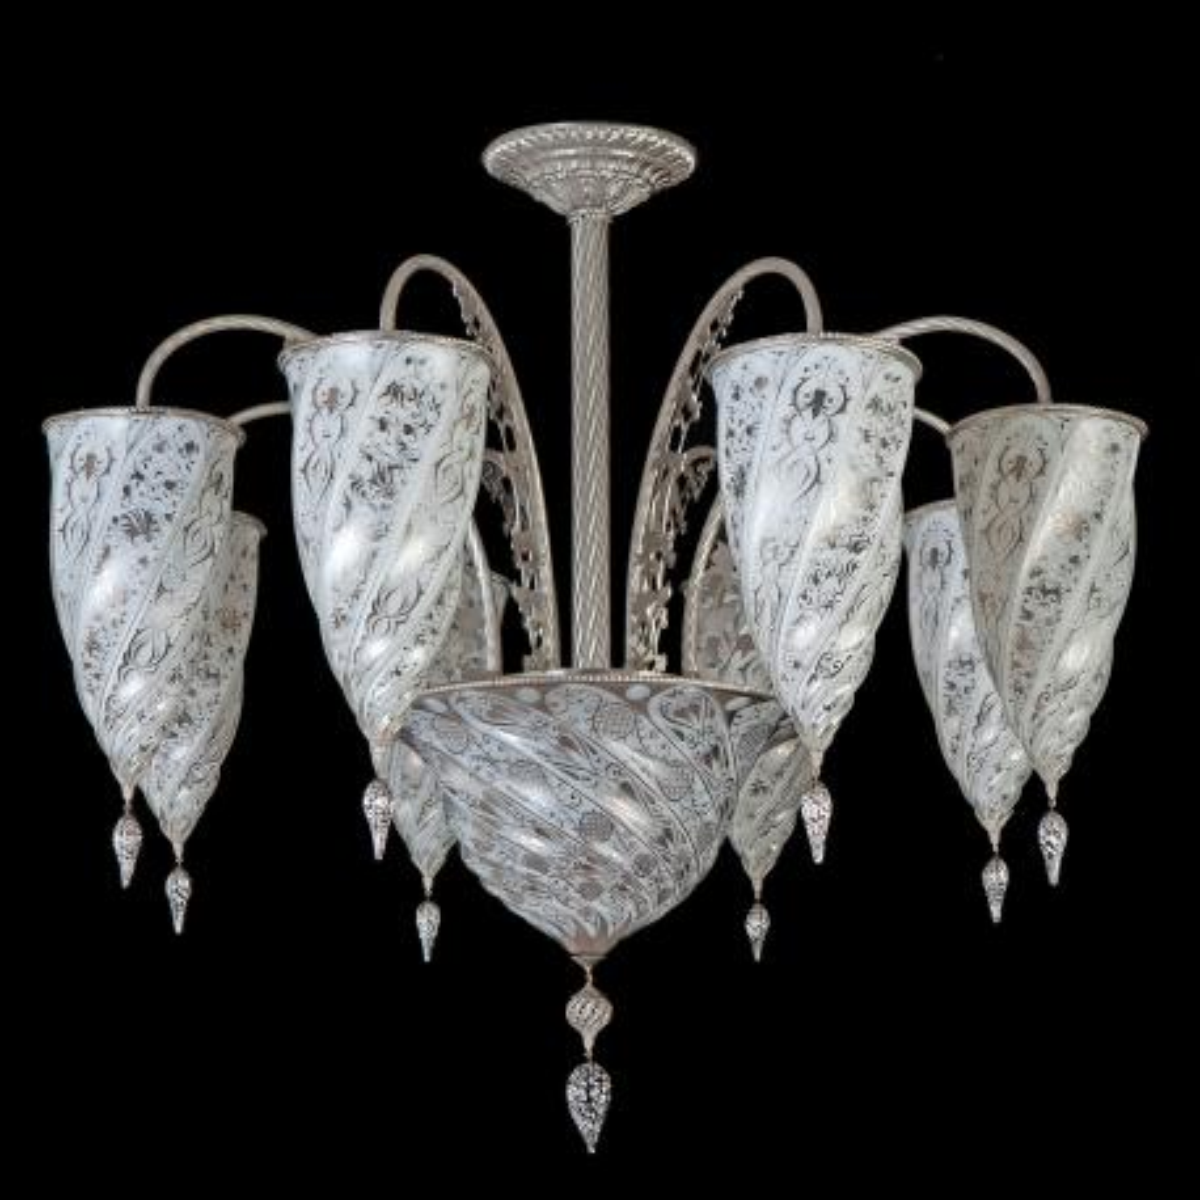 """Jibla"" Murano glas Kronleuchter - 9 flammig - weiß"